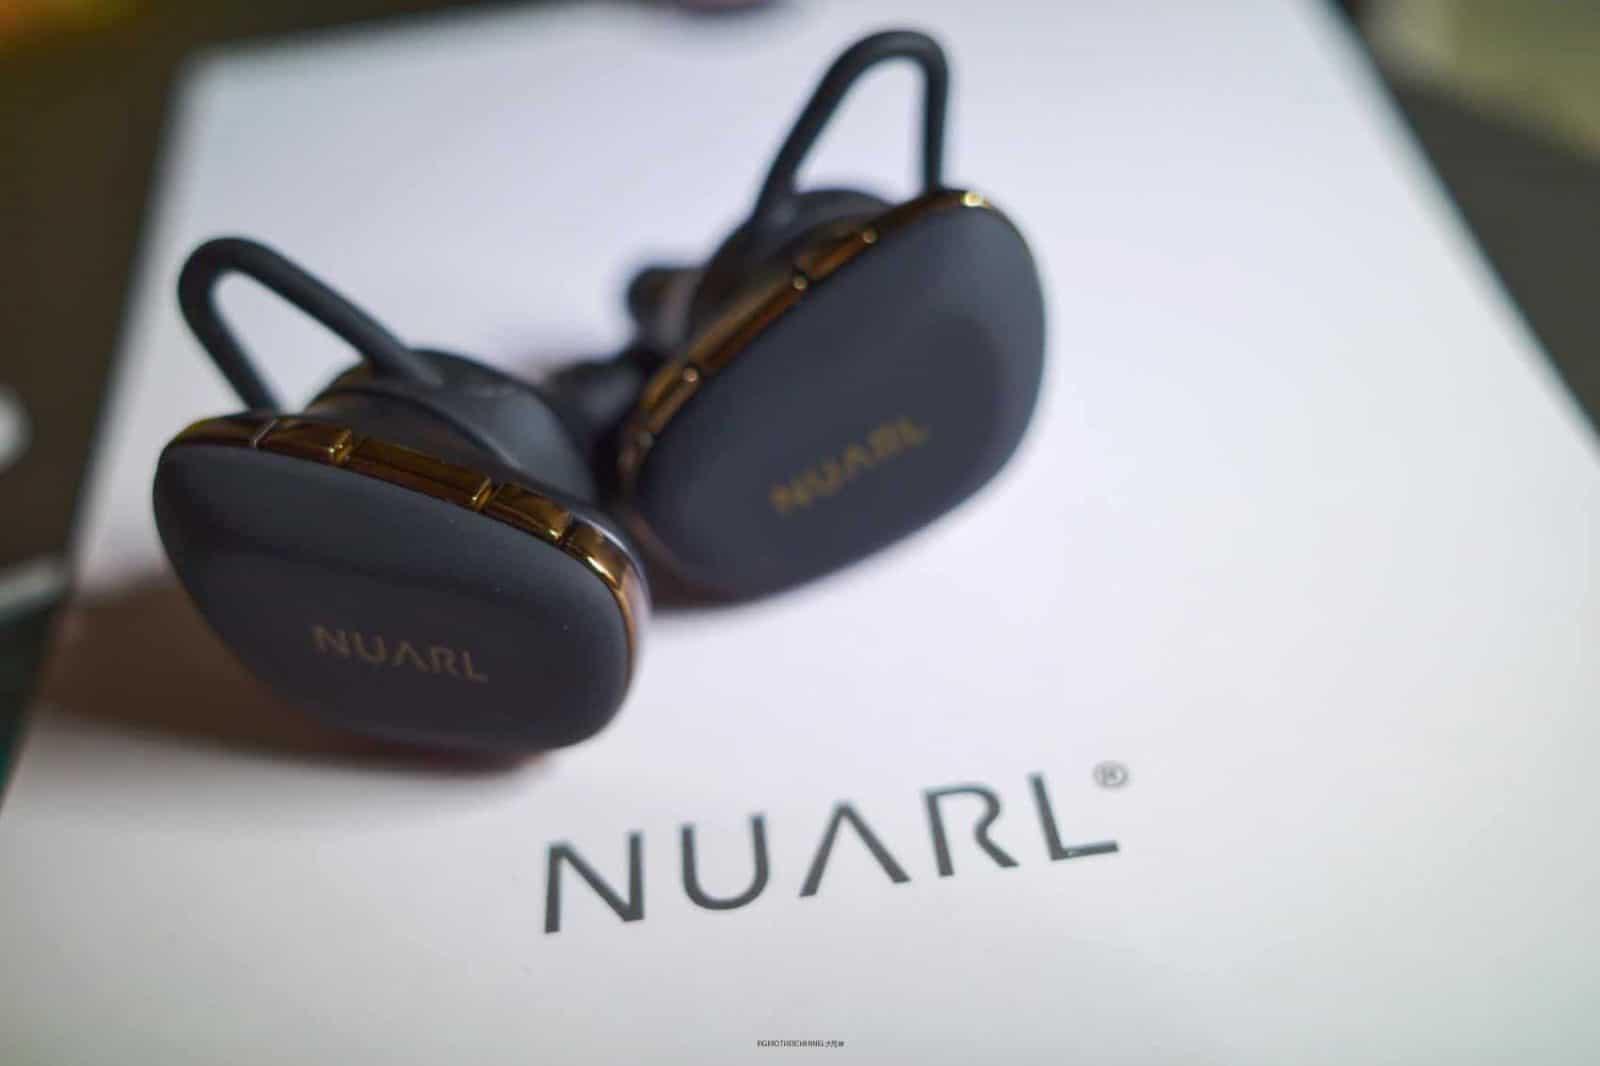 nuarl n6 pro開箱